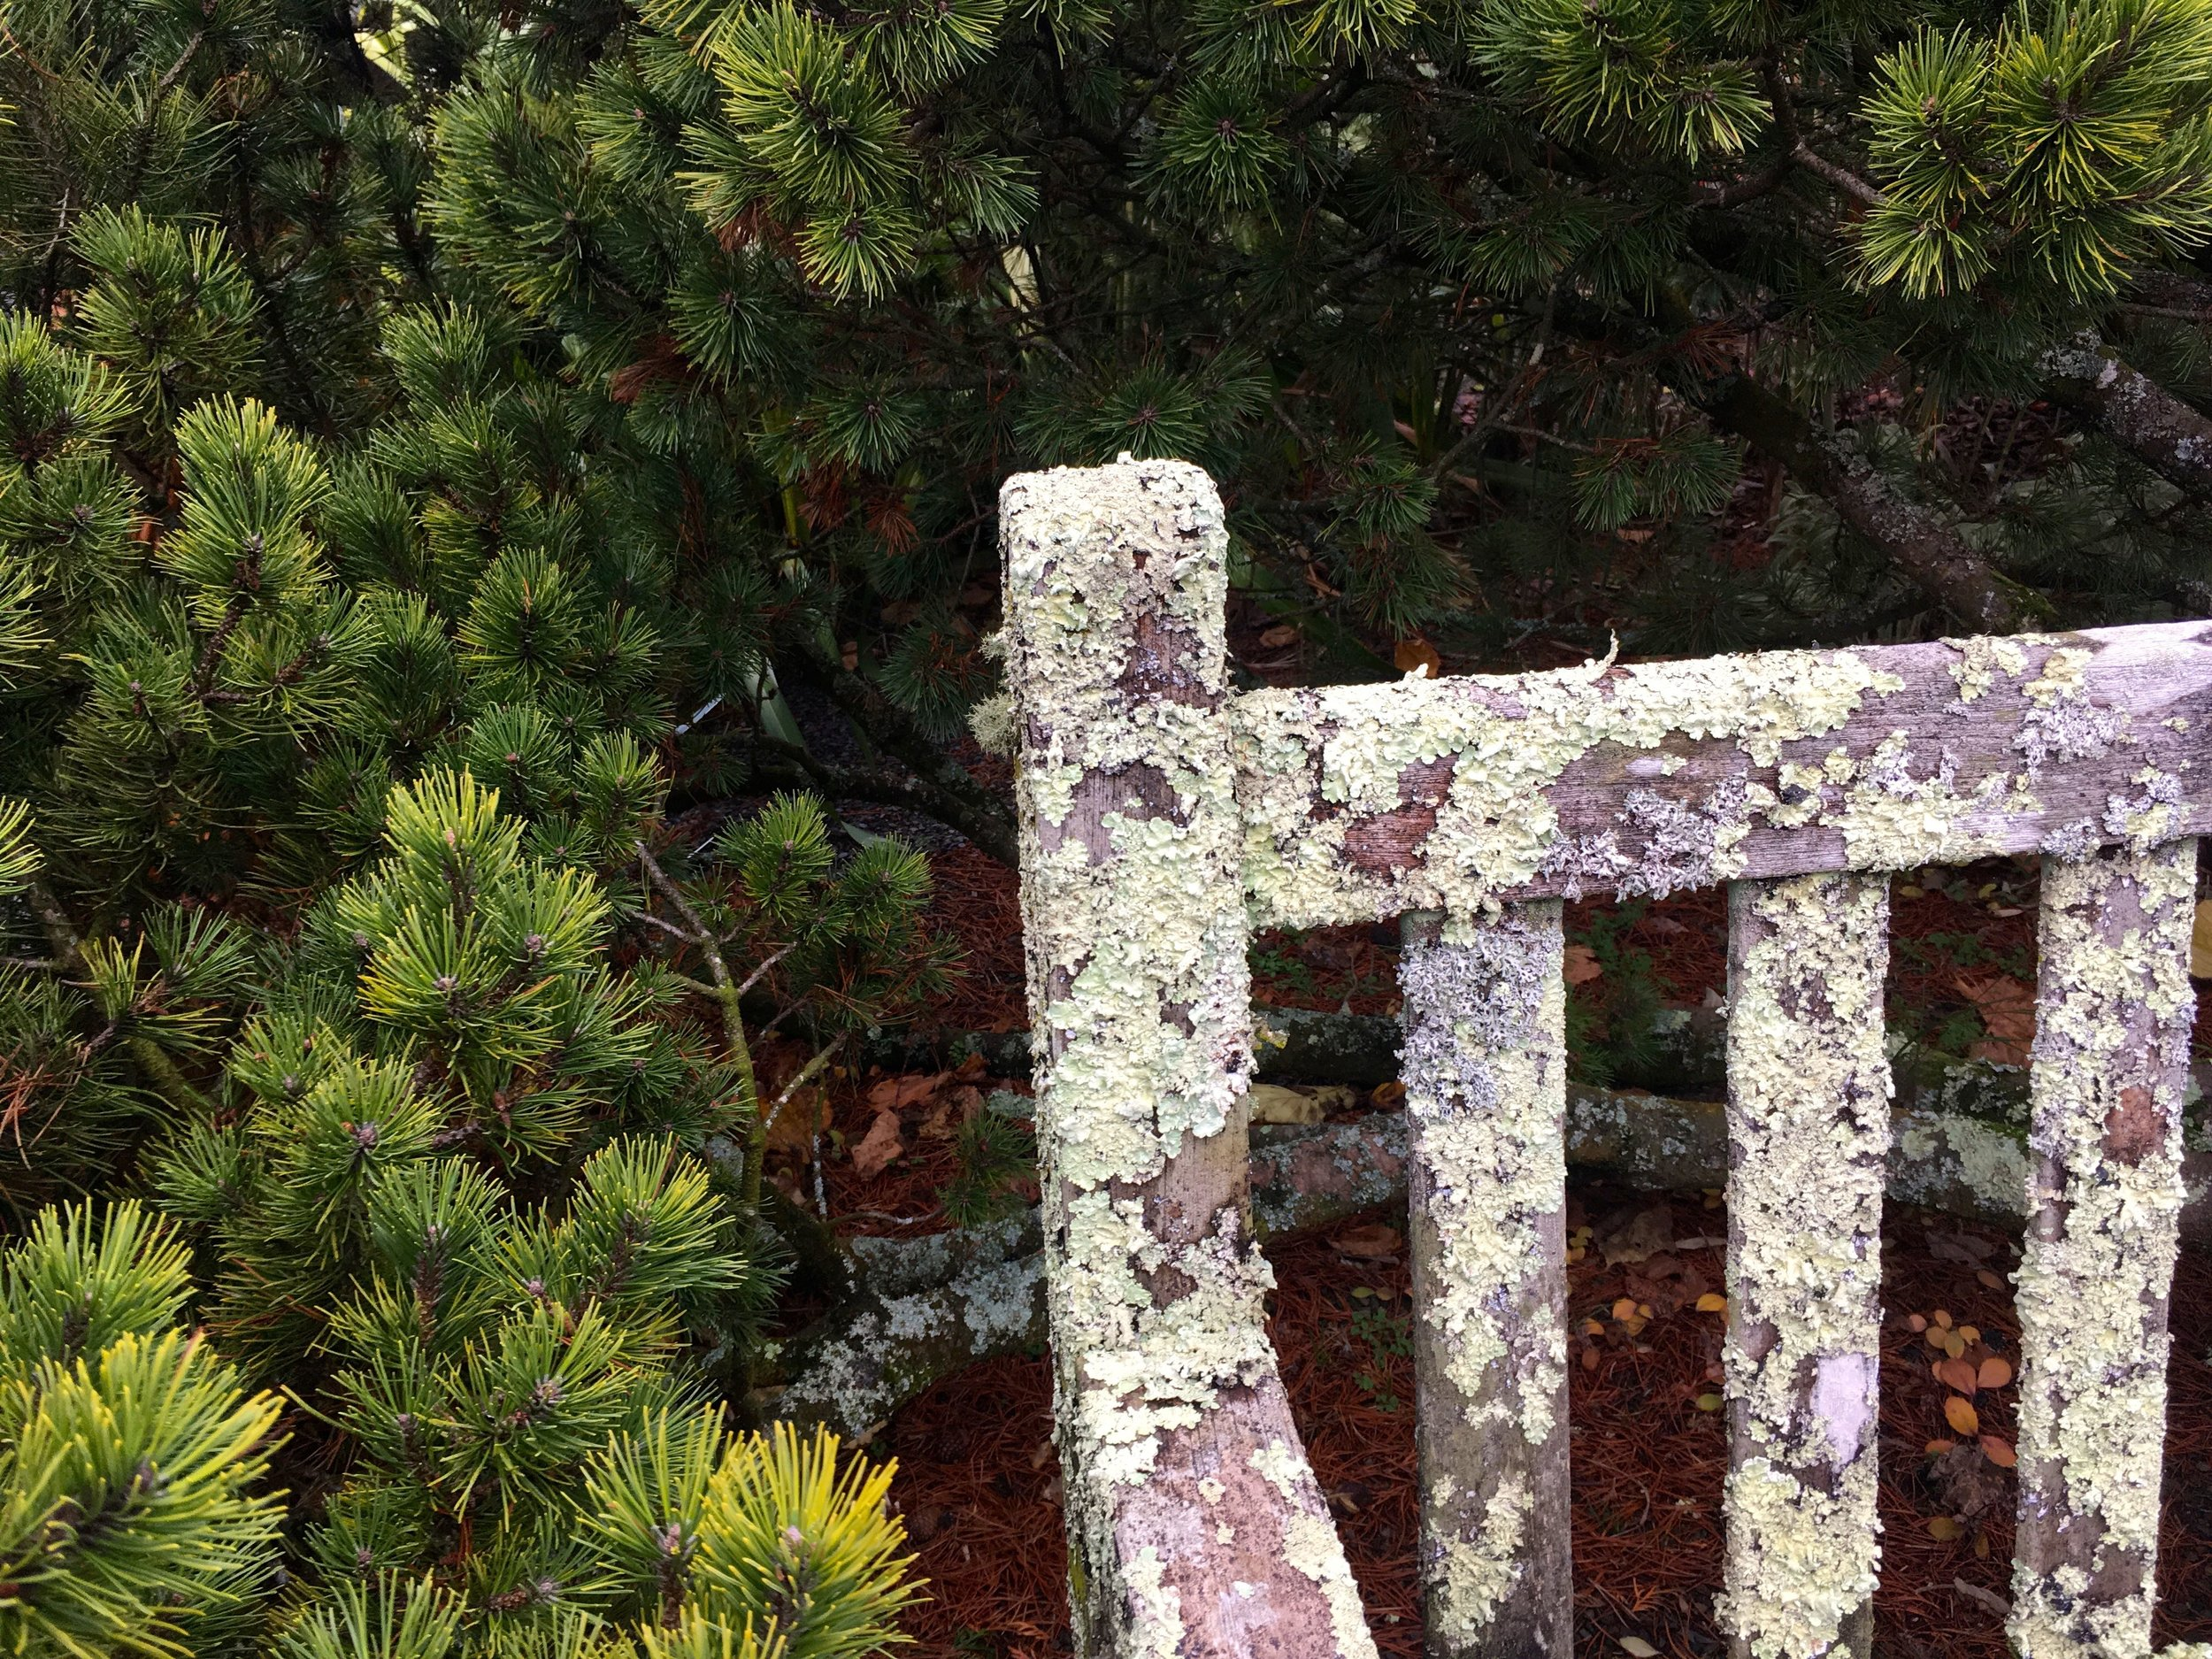 The lichen bench at RHS Rosemoor